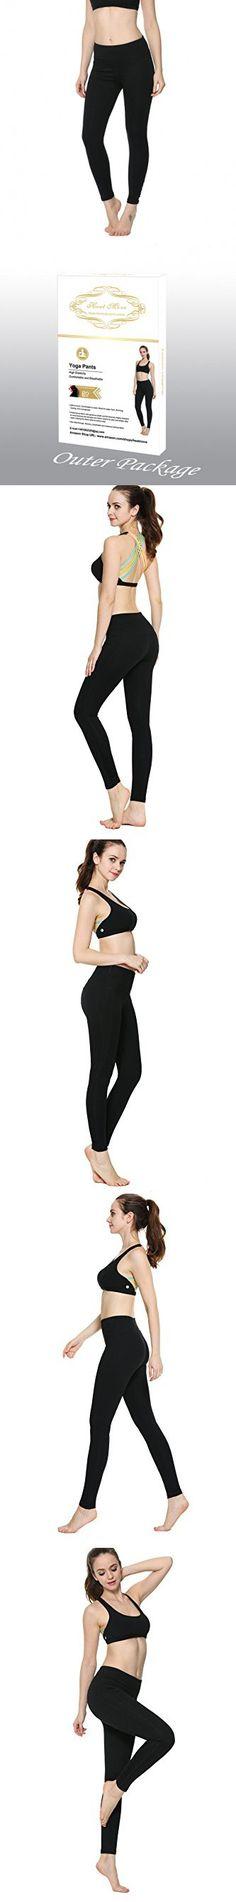 Dating a gym girl reddit